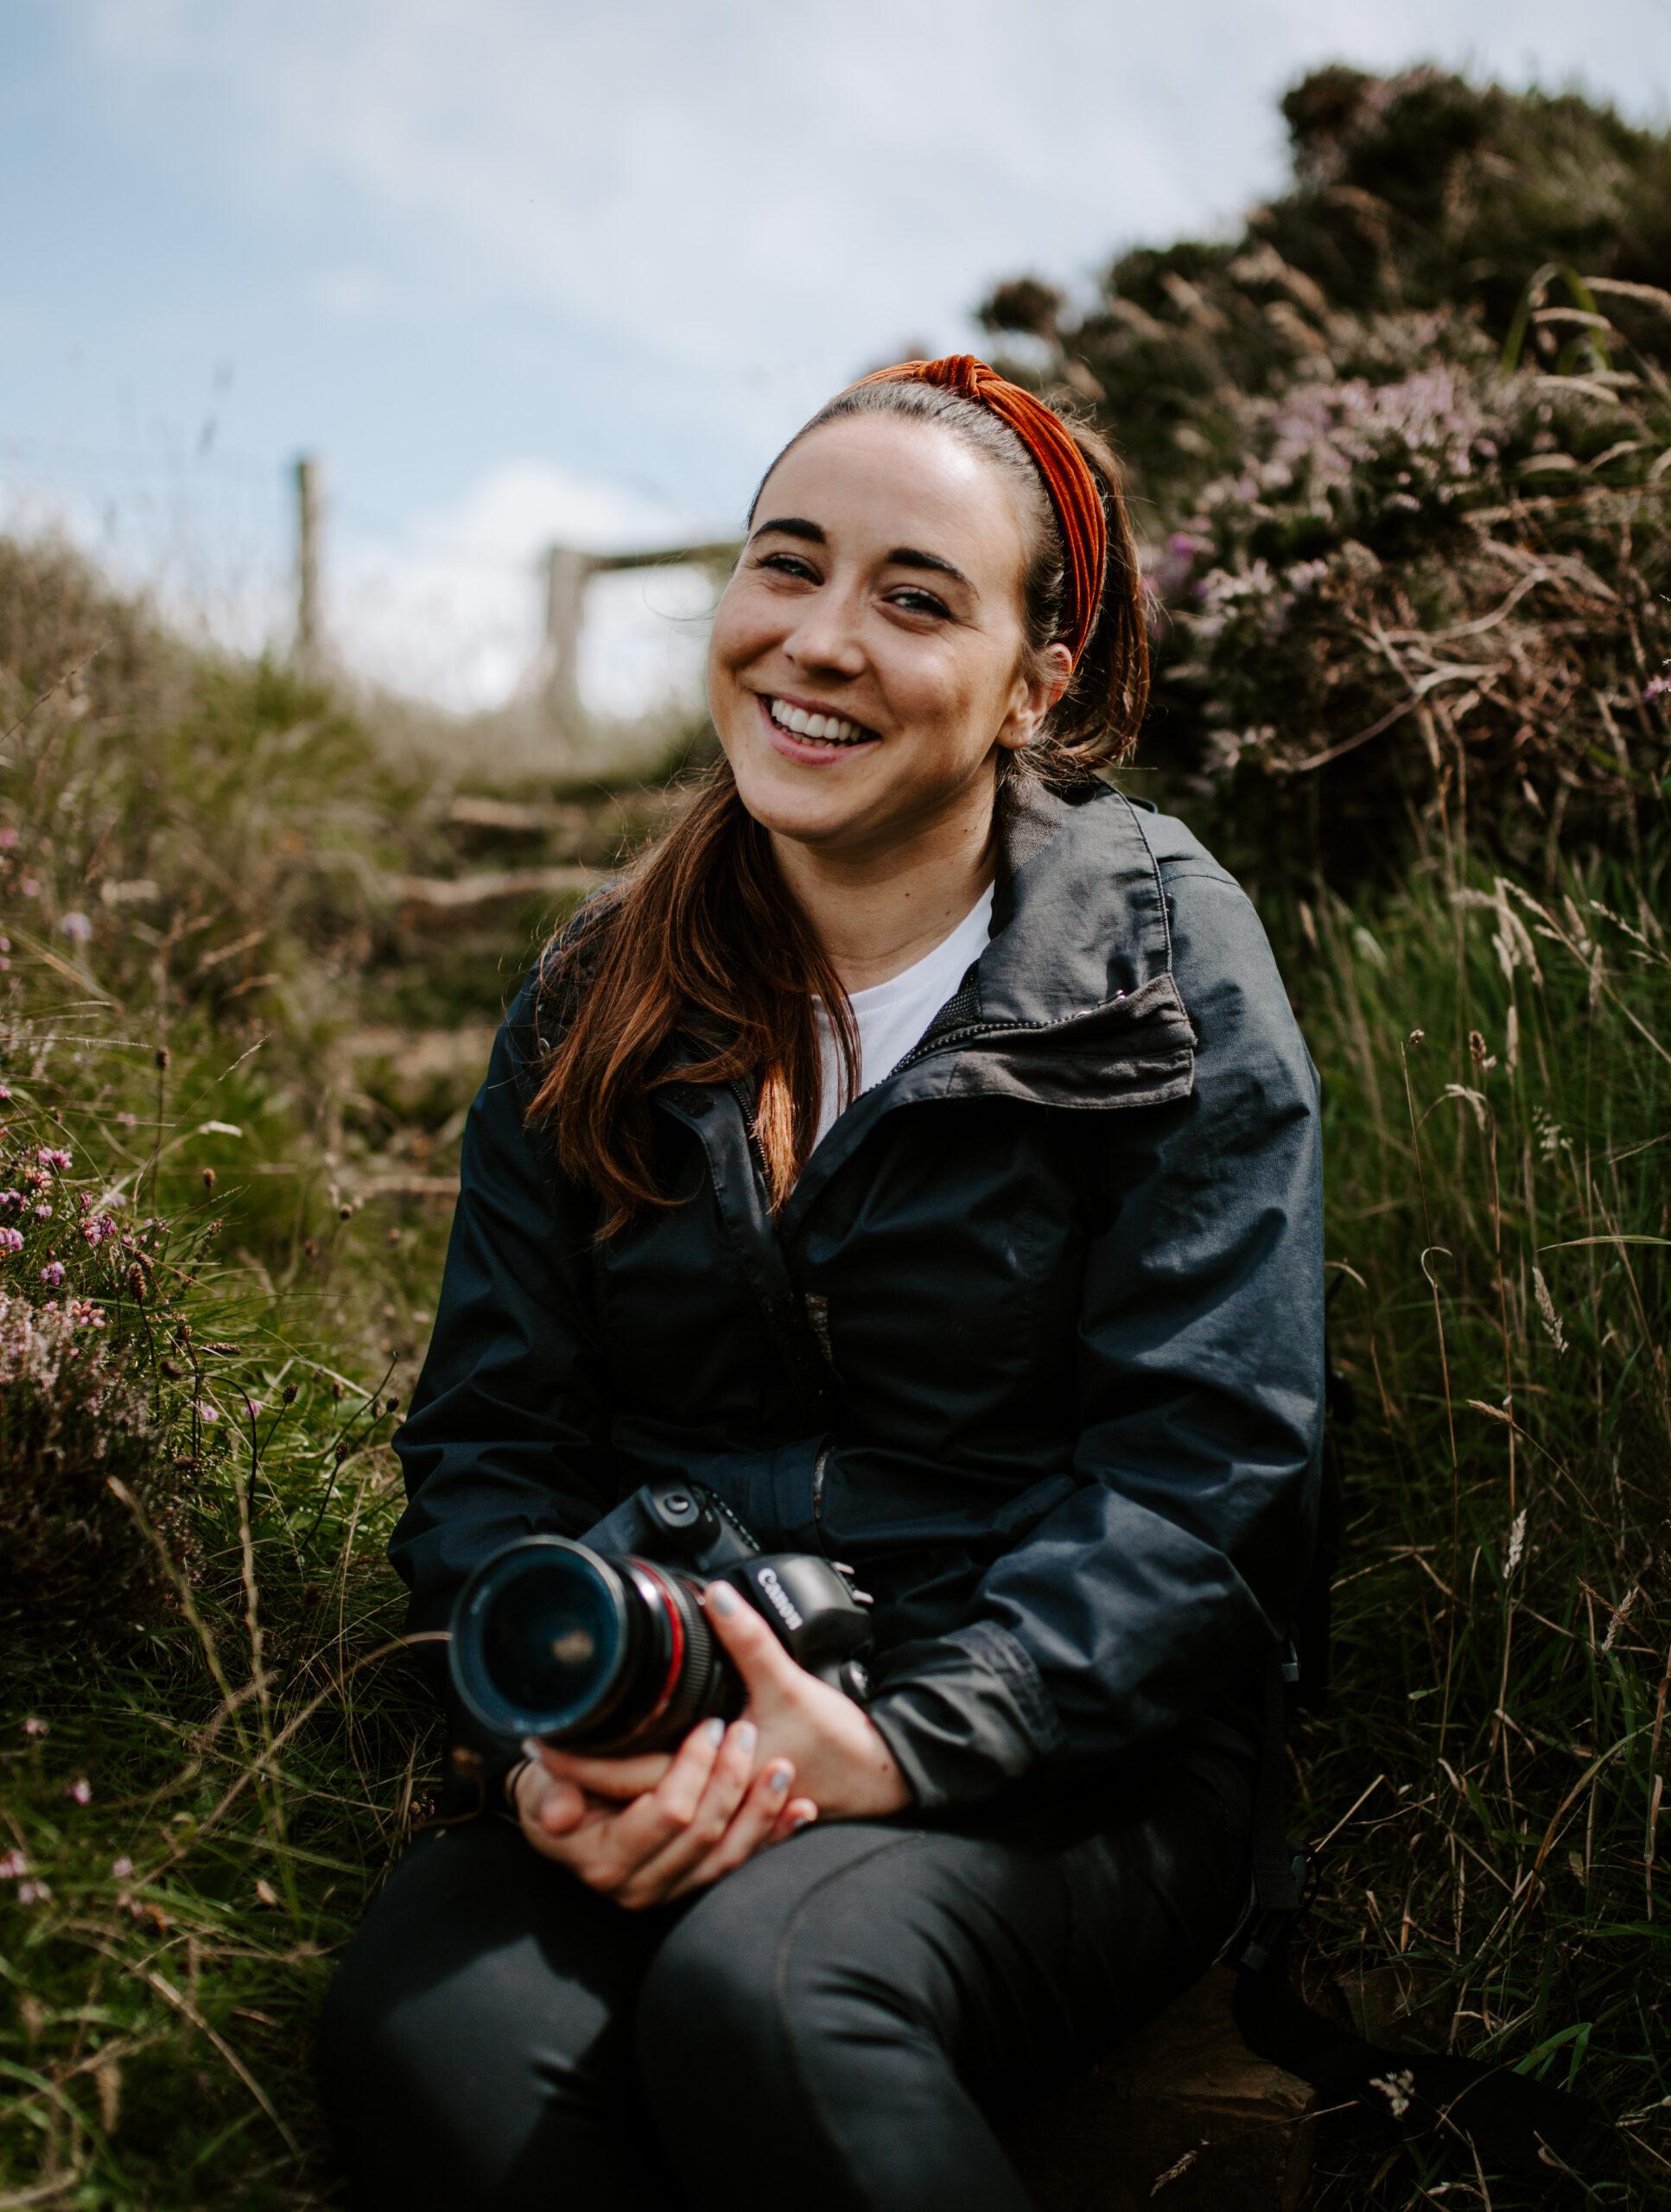 Sarah Gray Photography - Family Wedding Photographer